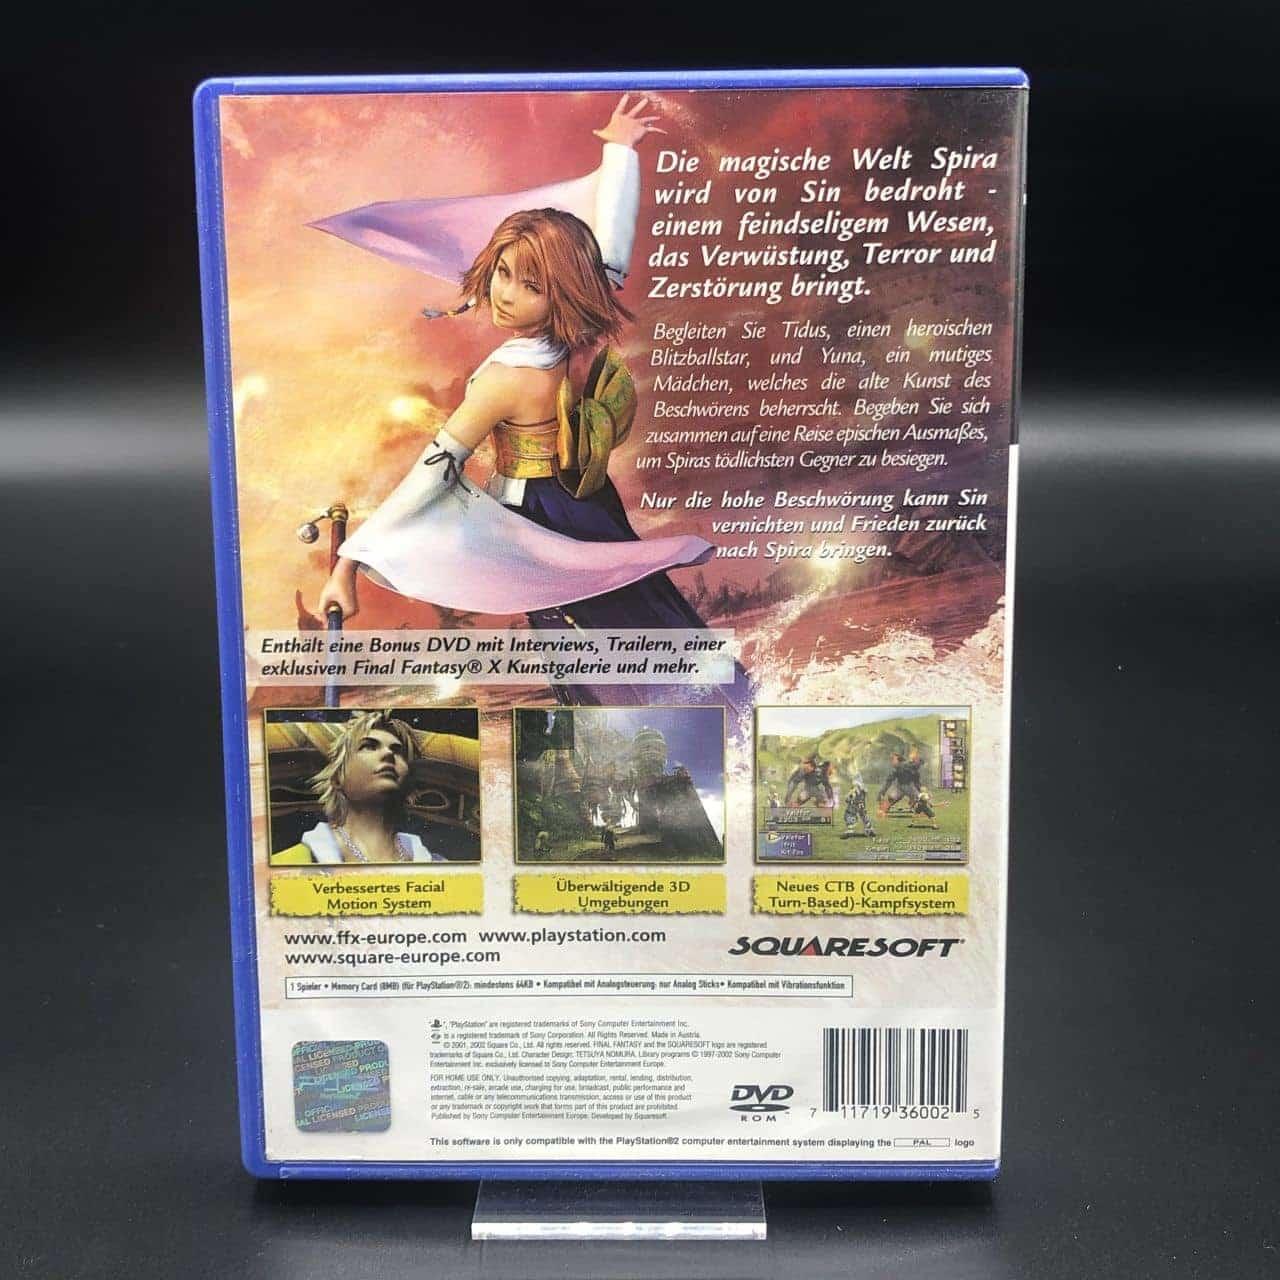 PS2 Final Fantasy X (Komplett) (Gebrauchsspuren) Sony PlayStation 2